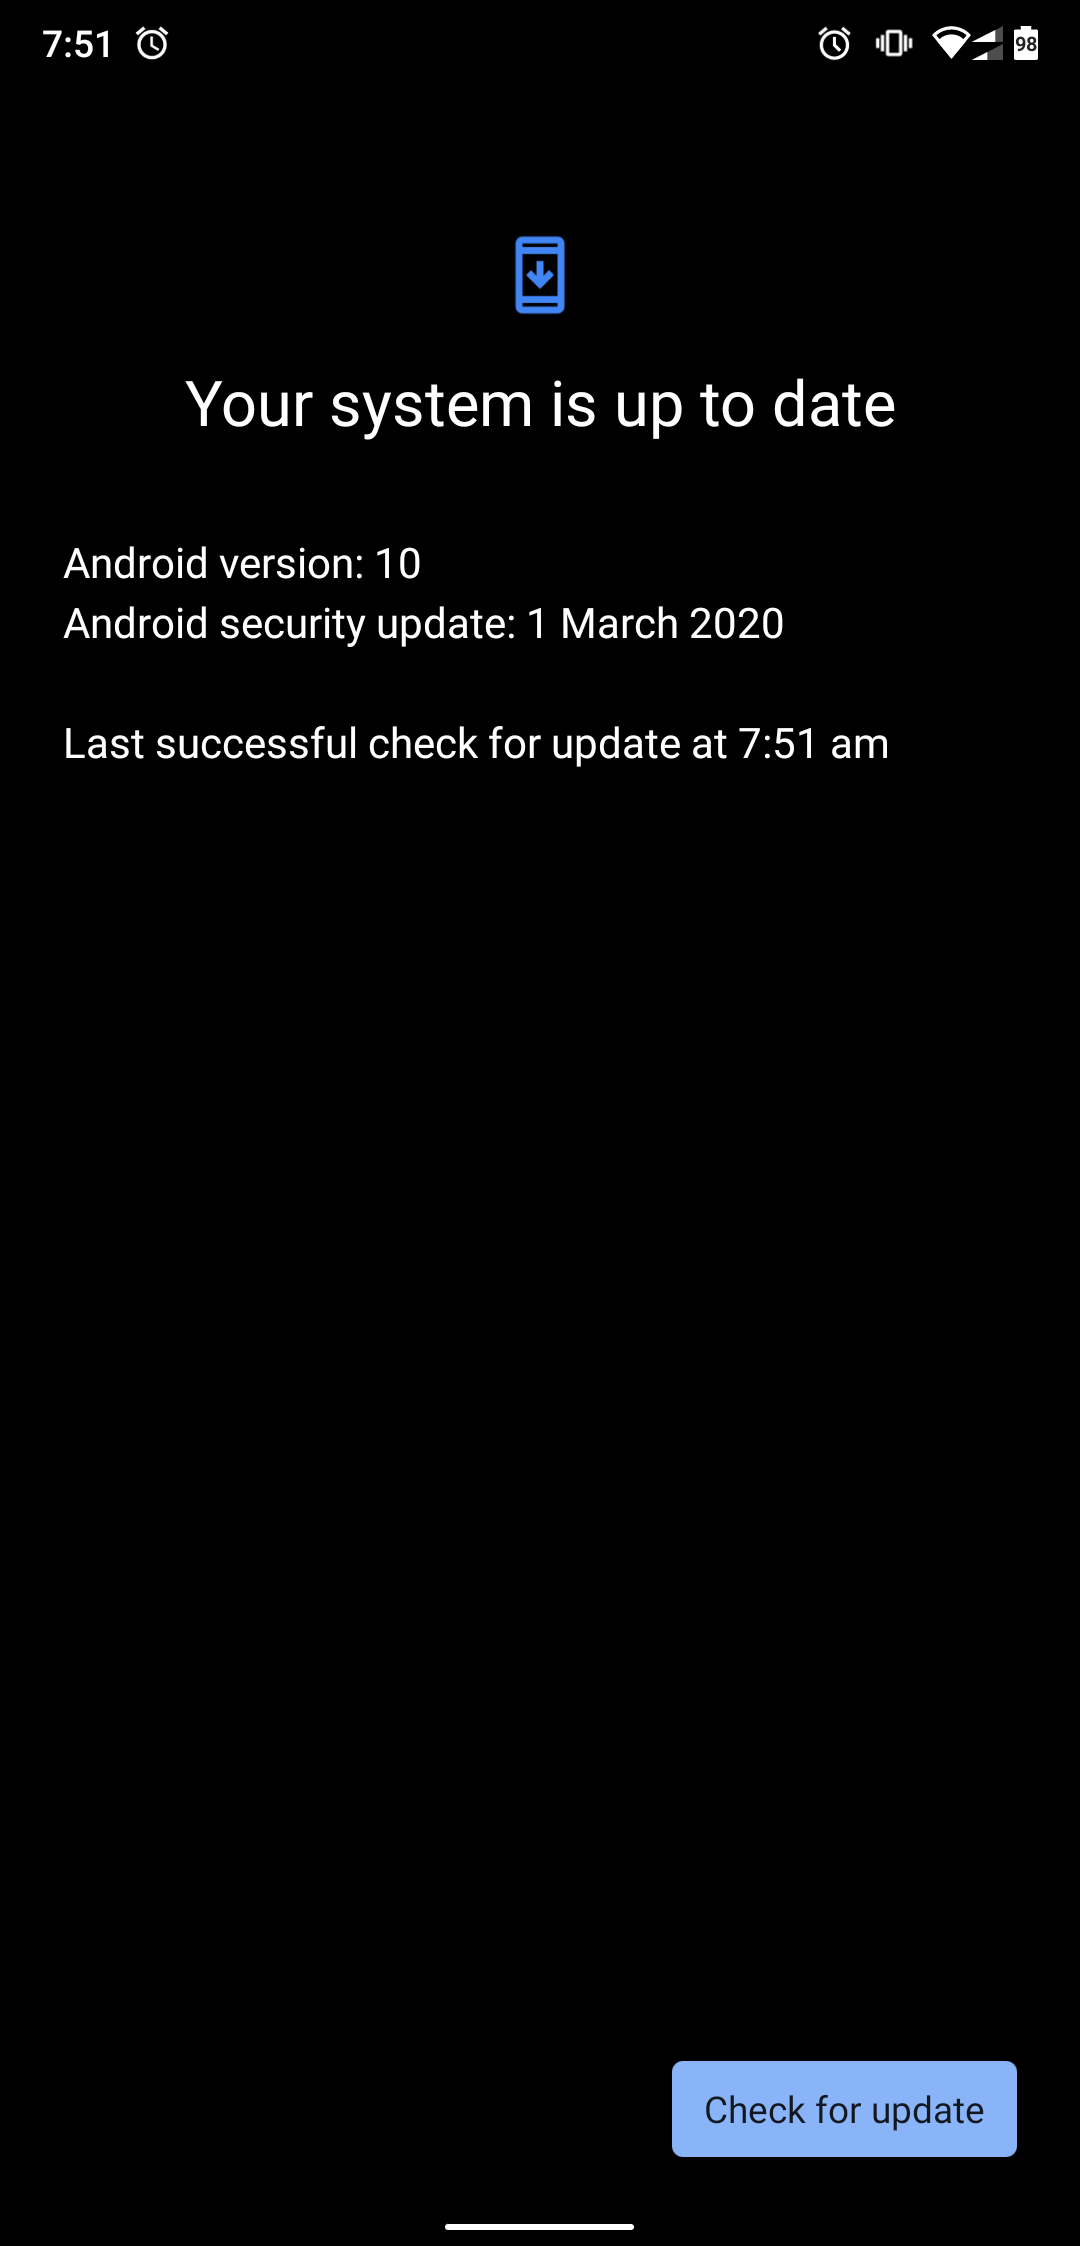 Screenshot_20200618-075150.png